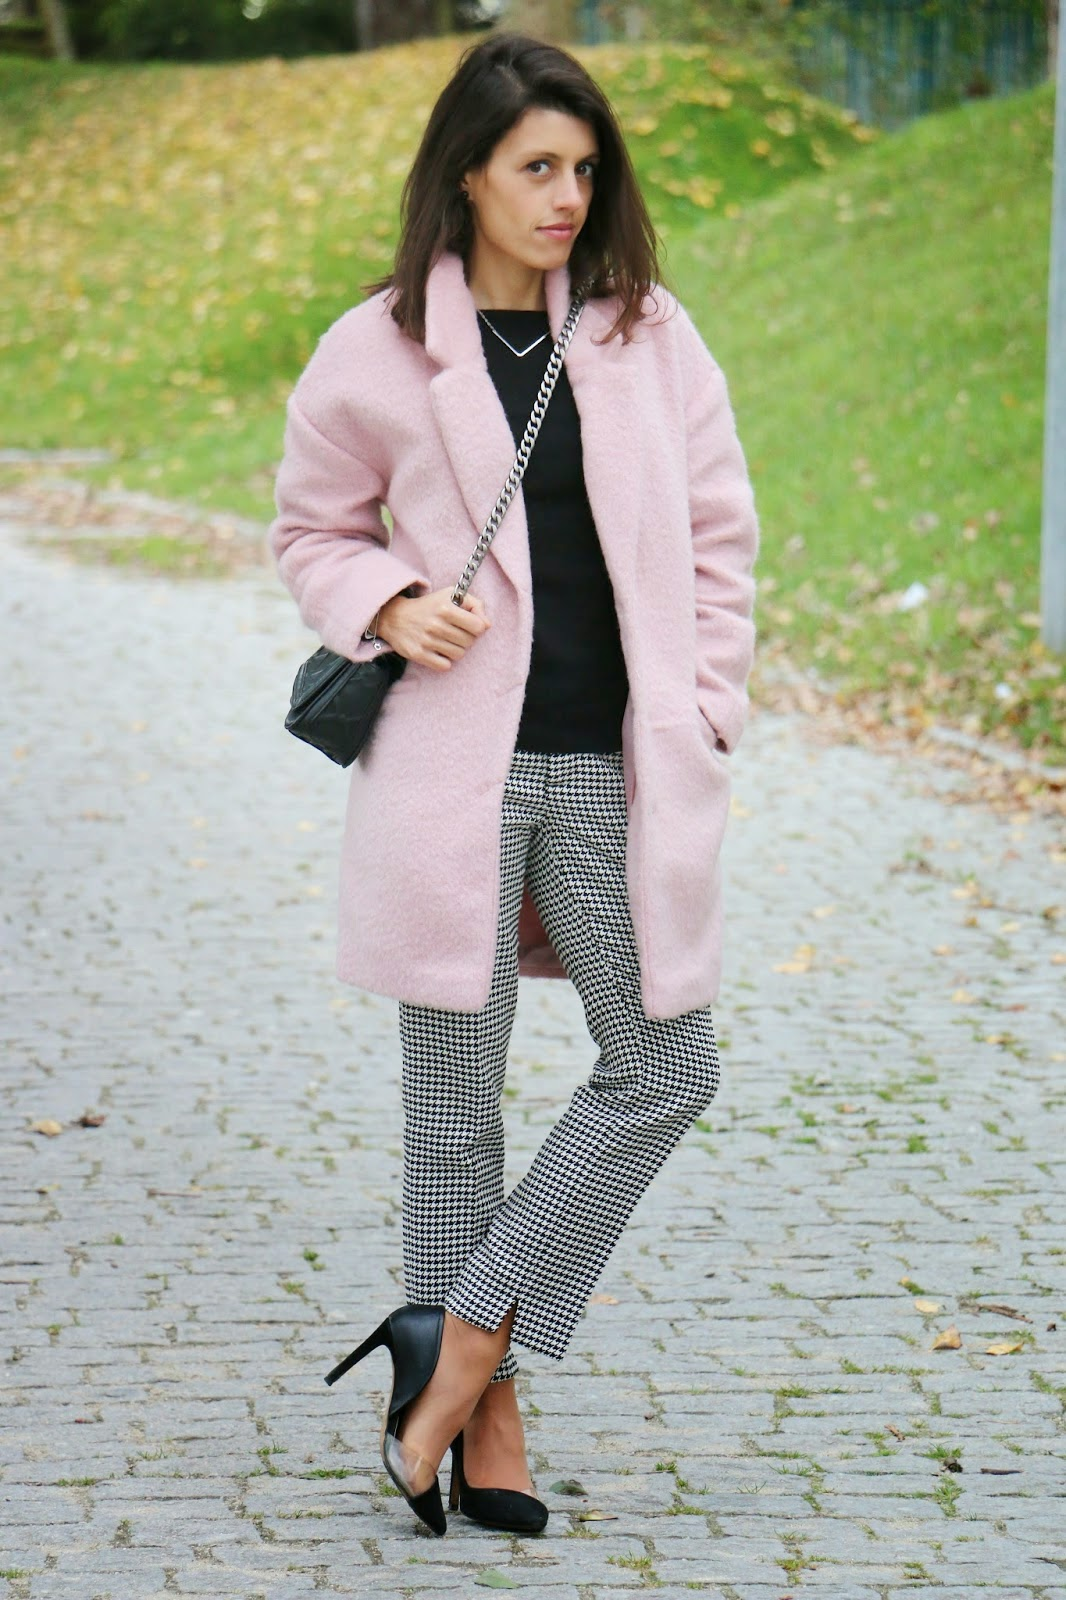 http://ilovefitametrica.blogspot.pt/2014/12/pink-lady.html